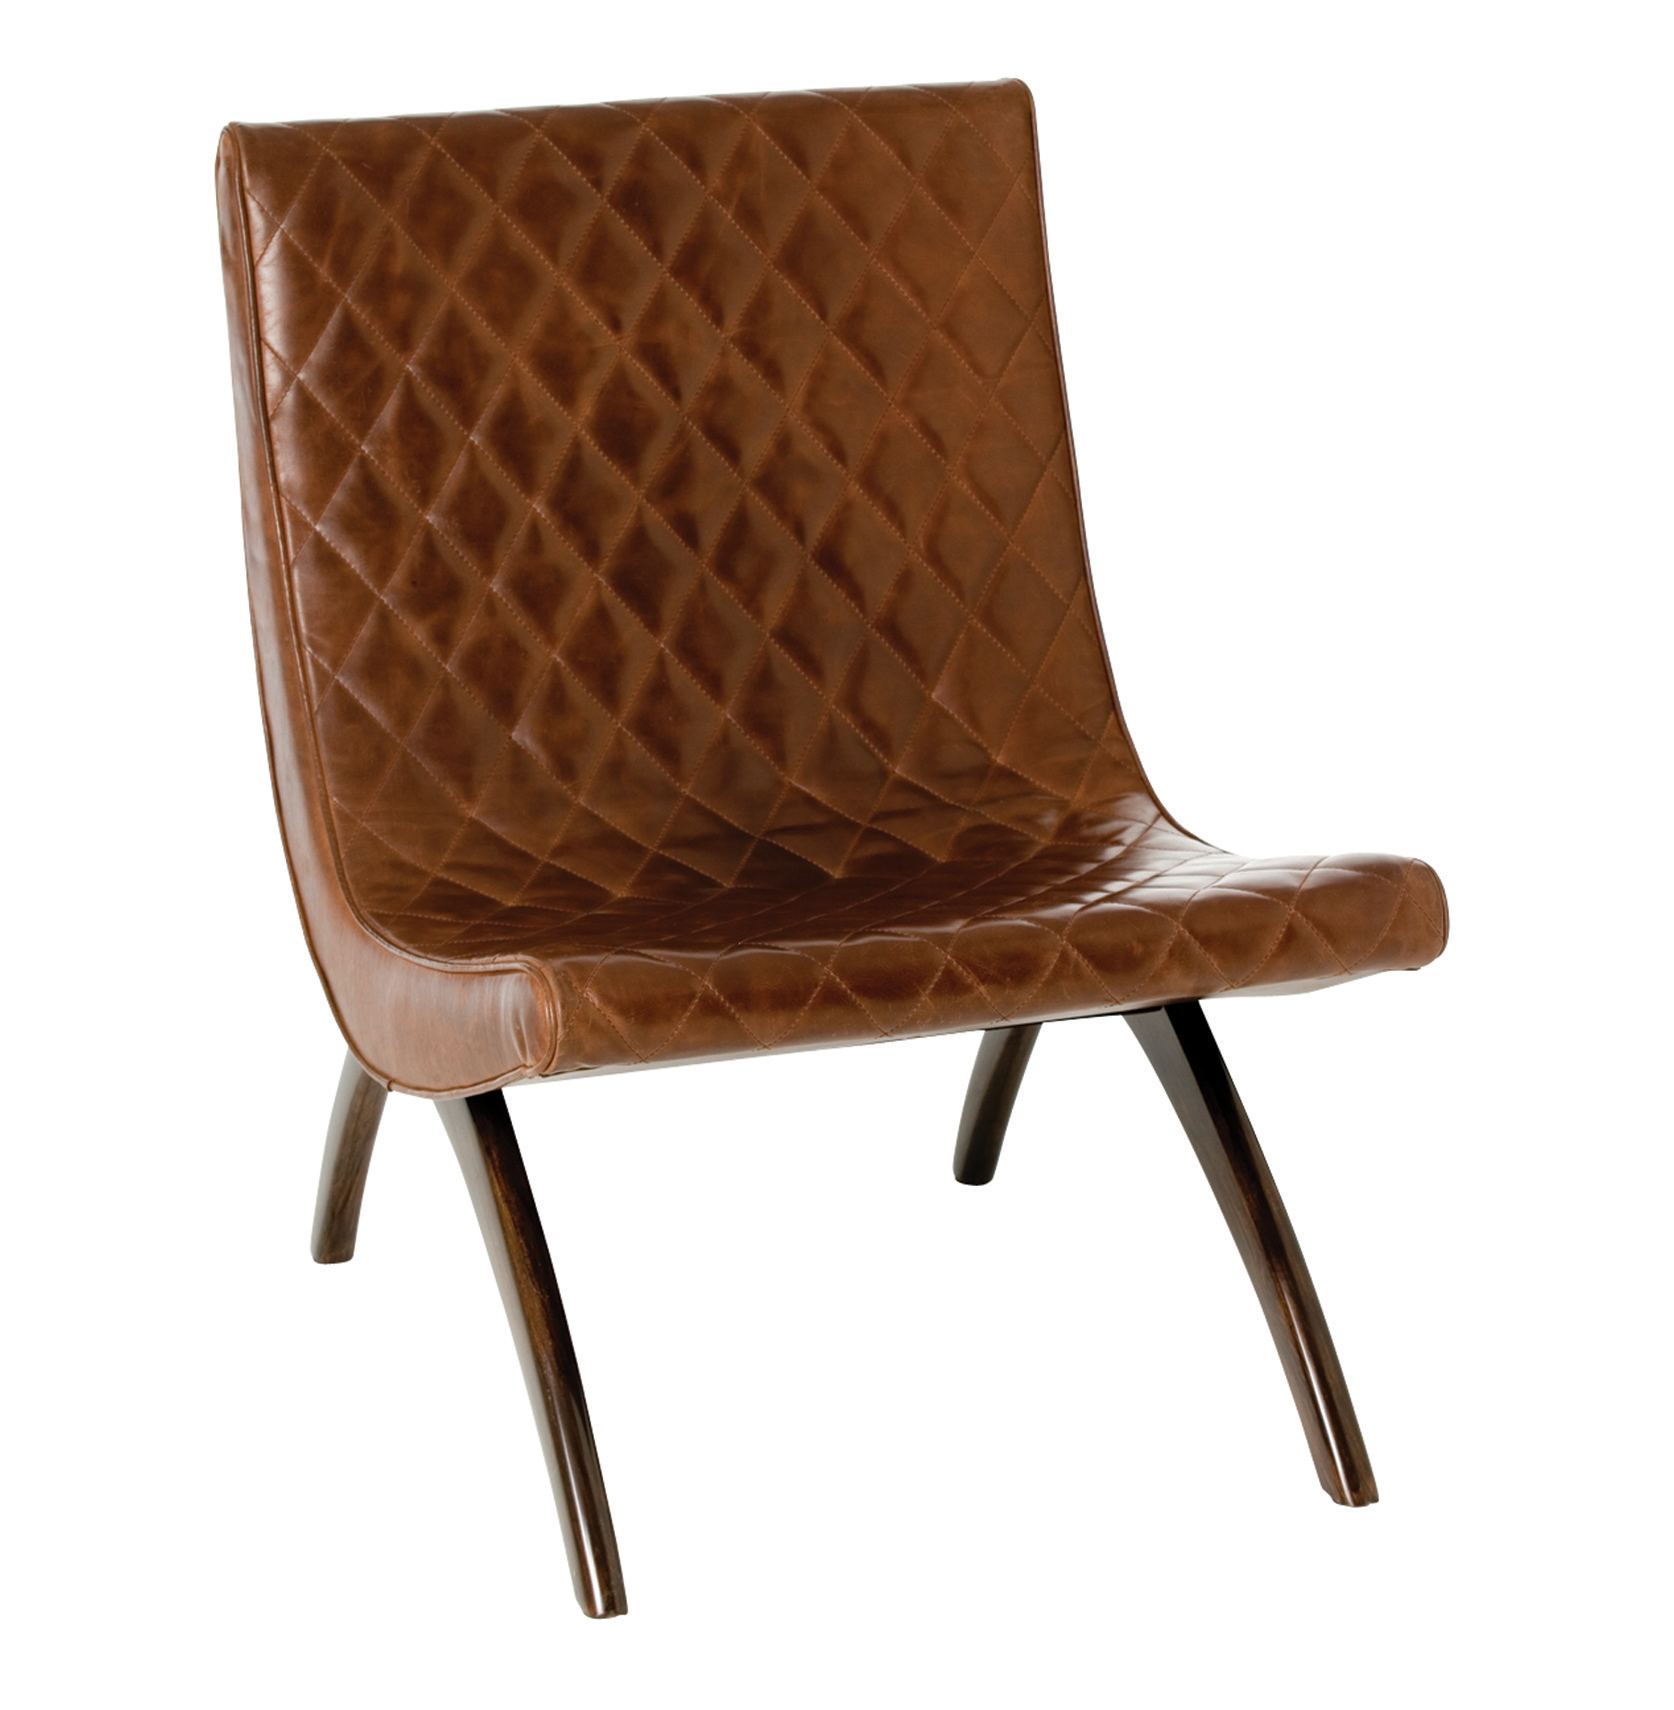 Danforth Mid Century Modern Chestnut Quilted Leather Chair